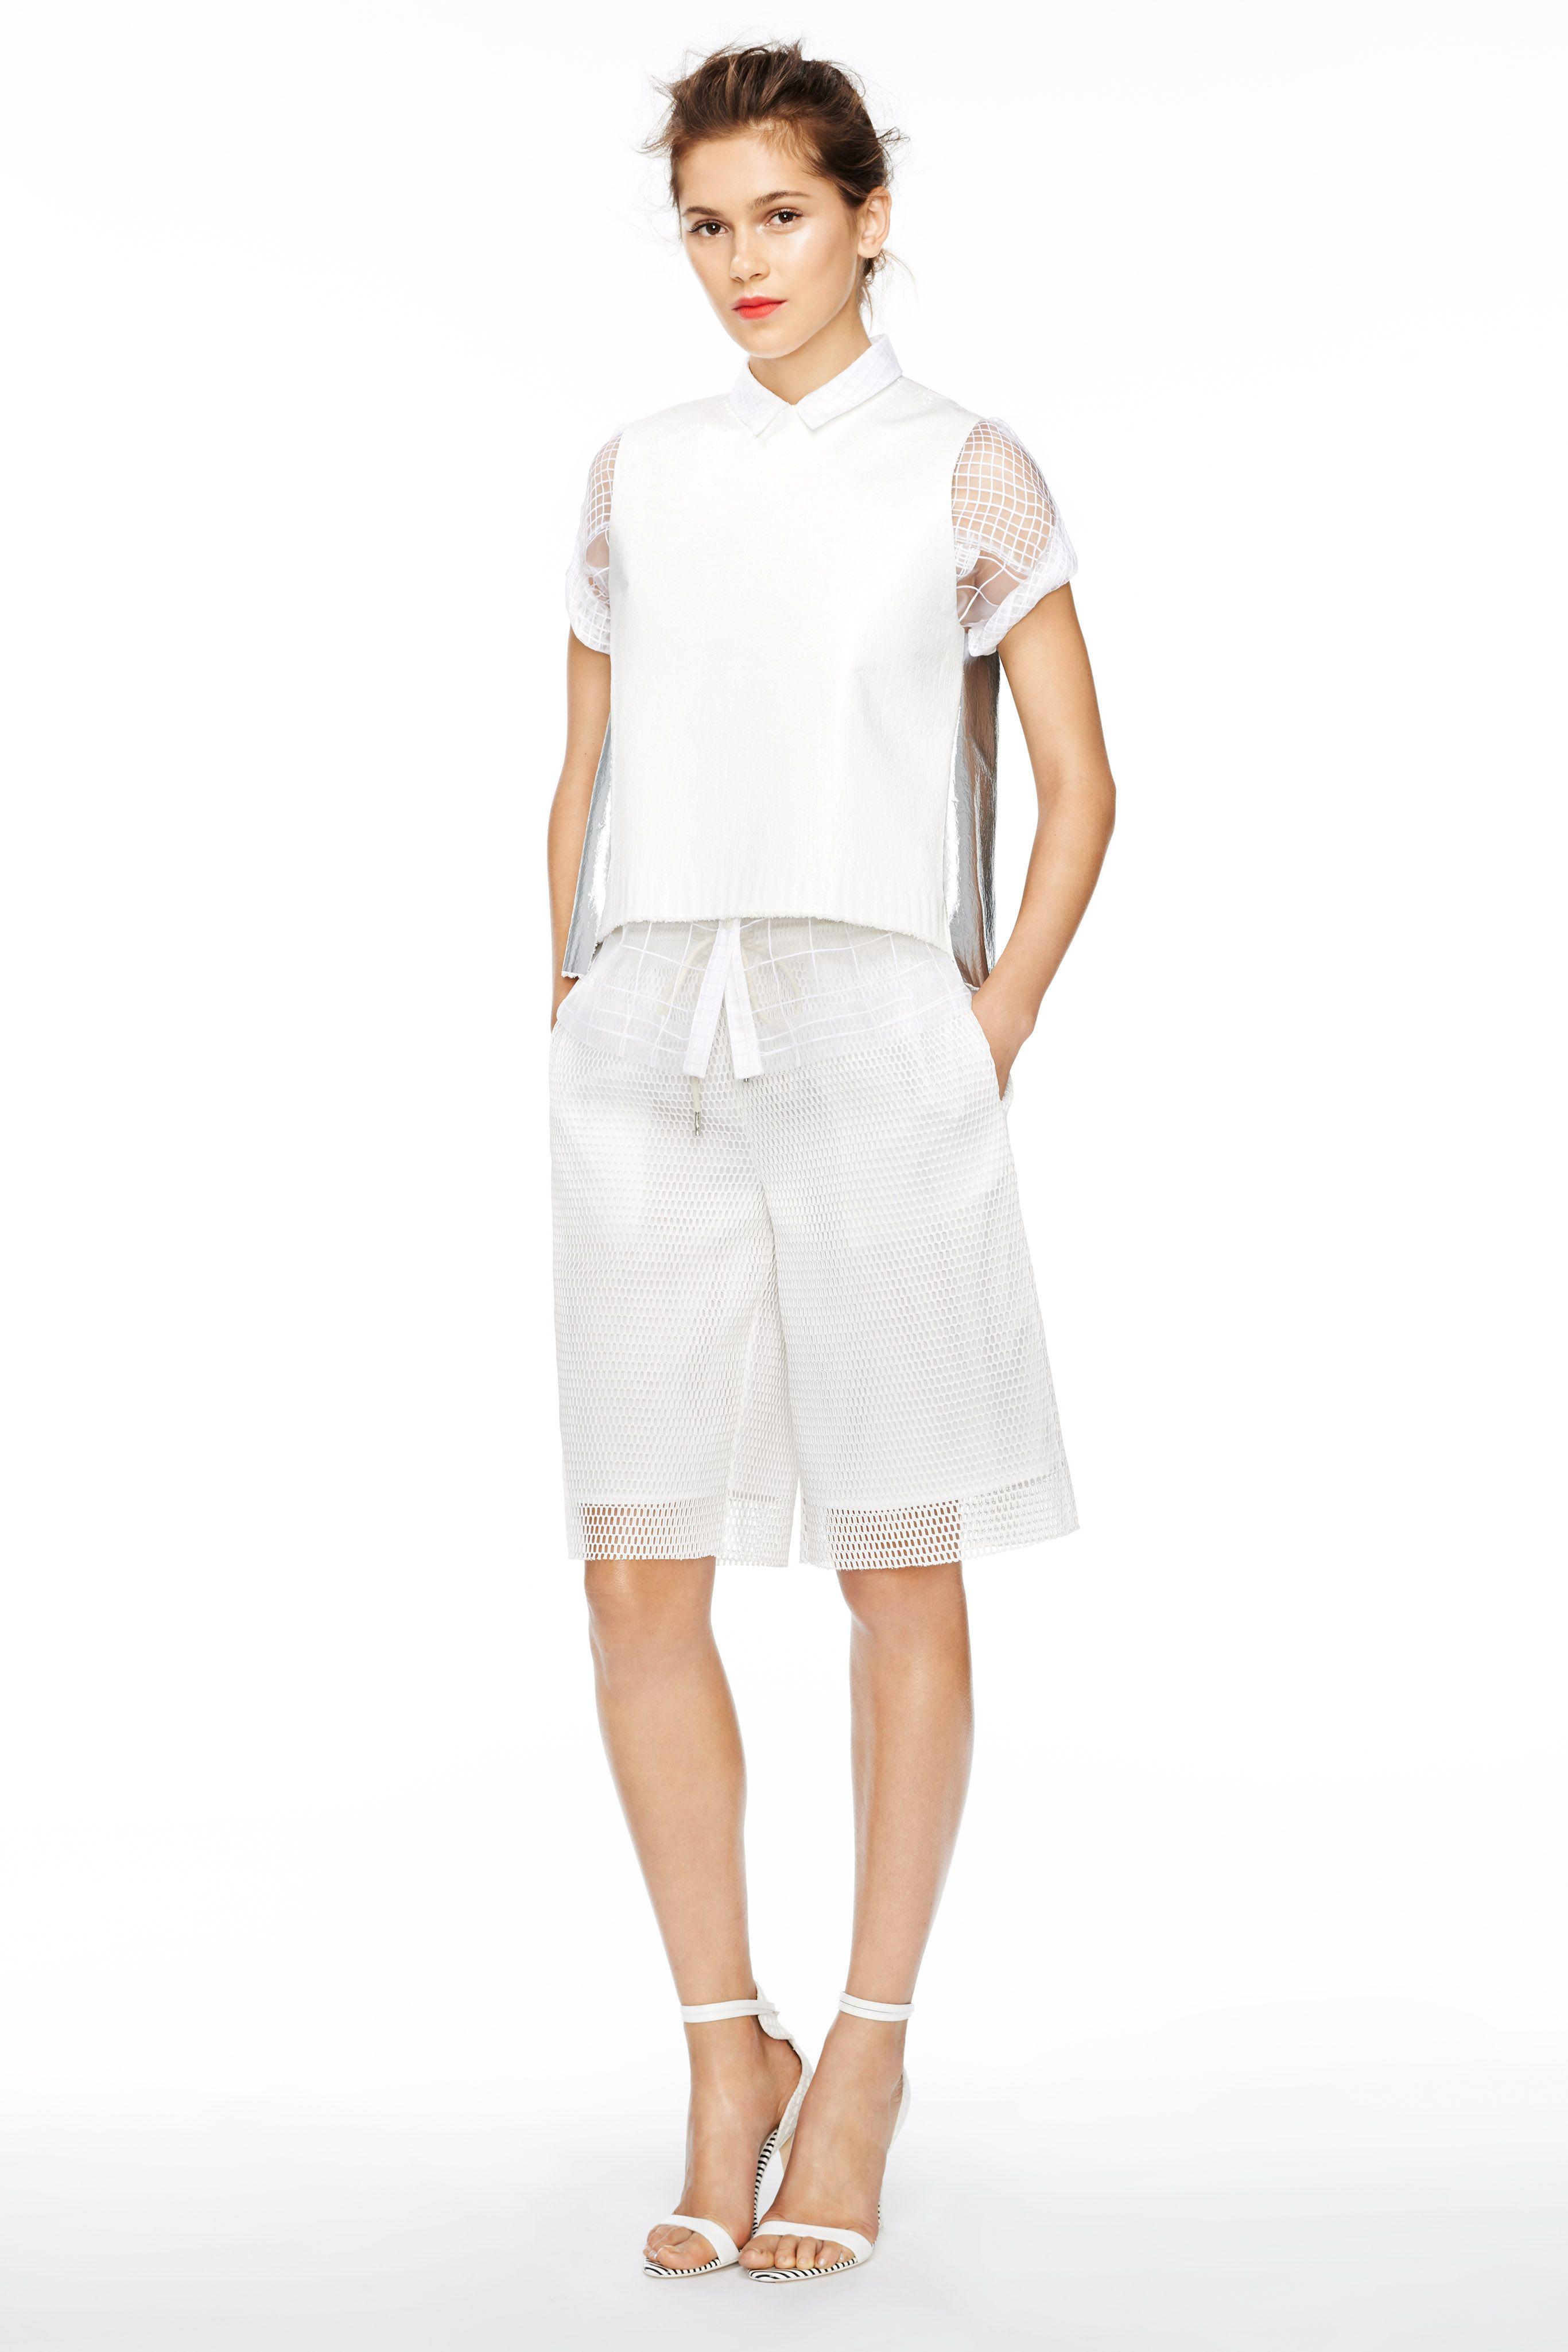 J.Crew SpringSummer 2015 Collection – New York Fashion Week